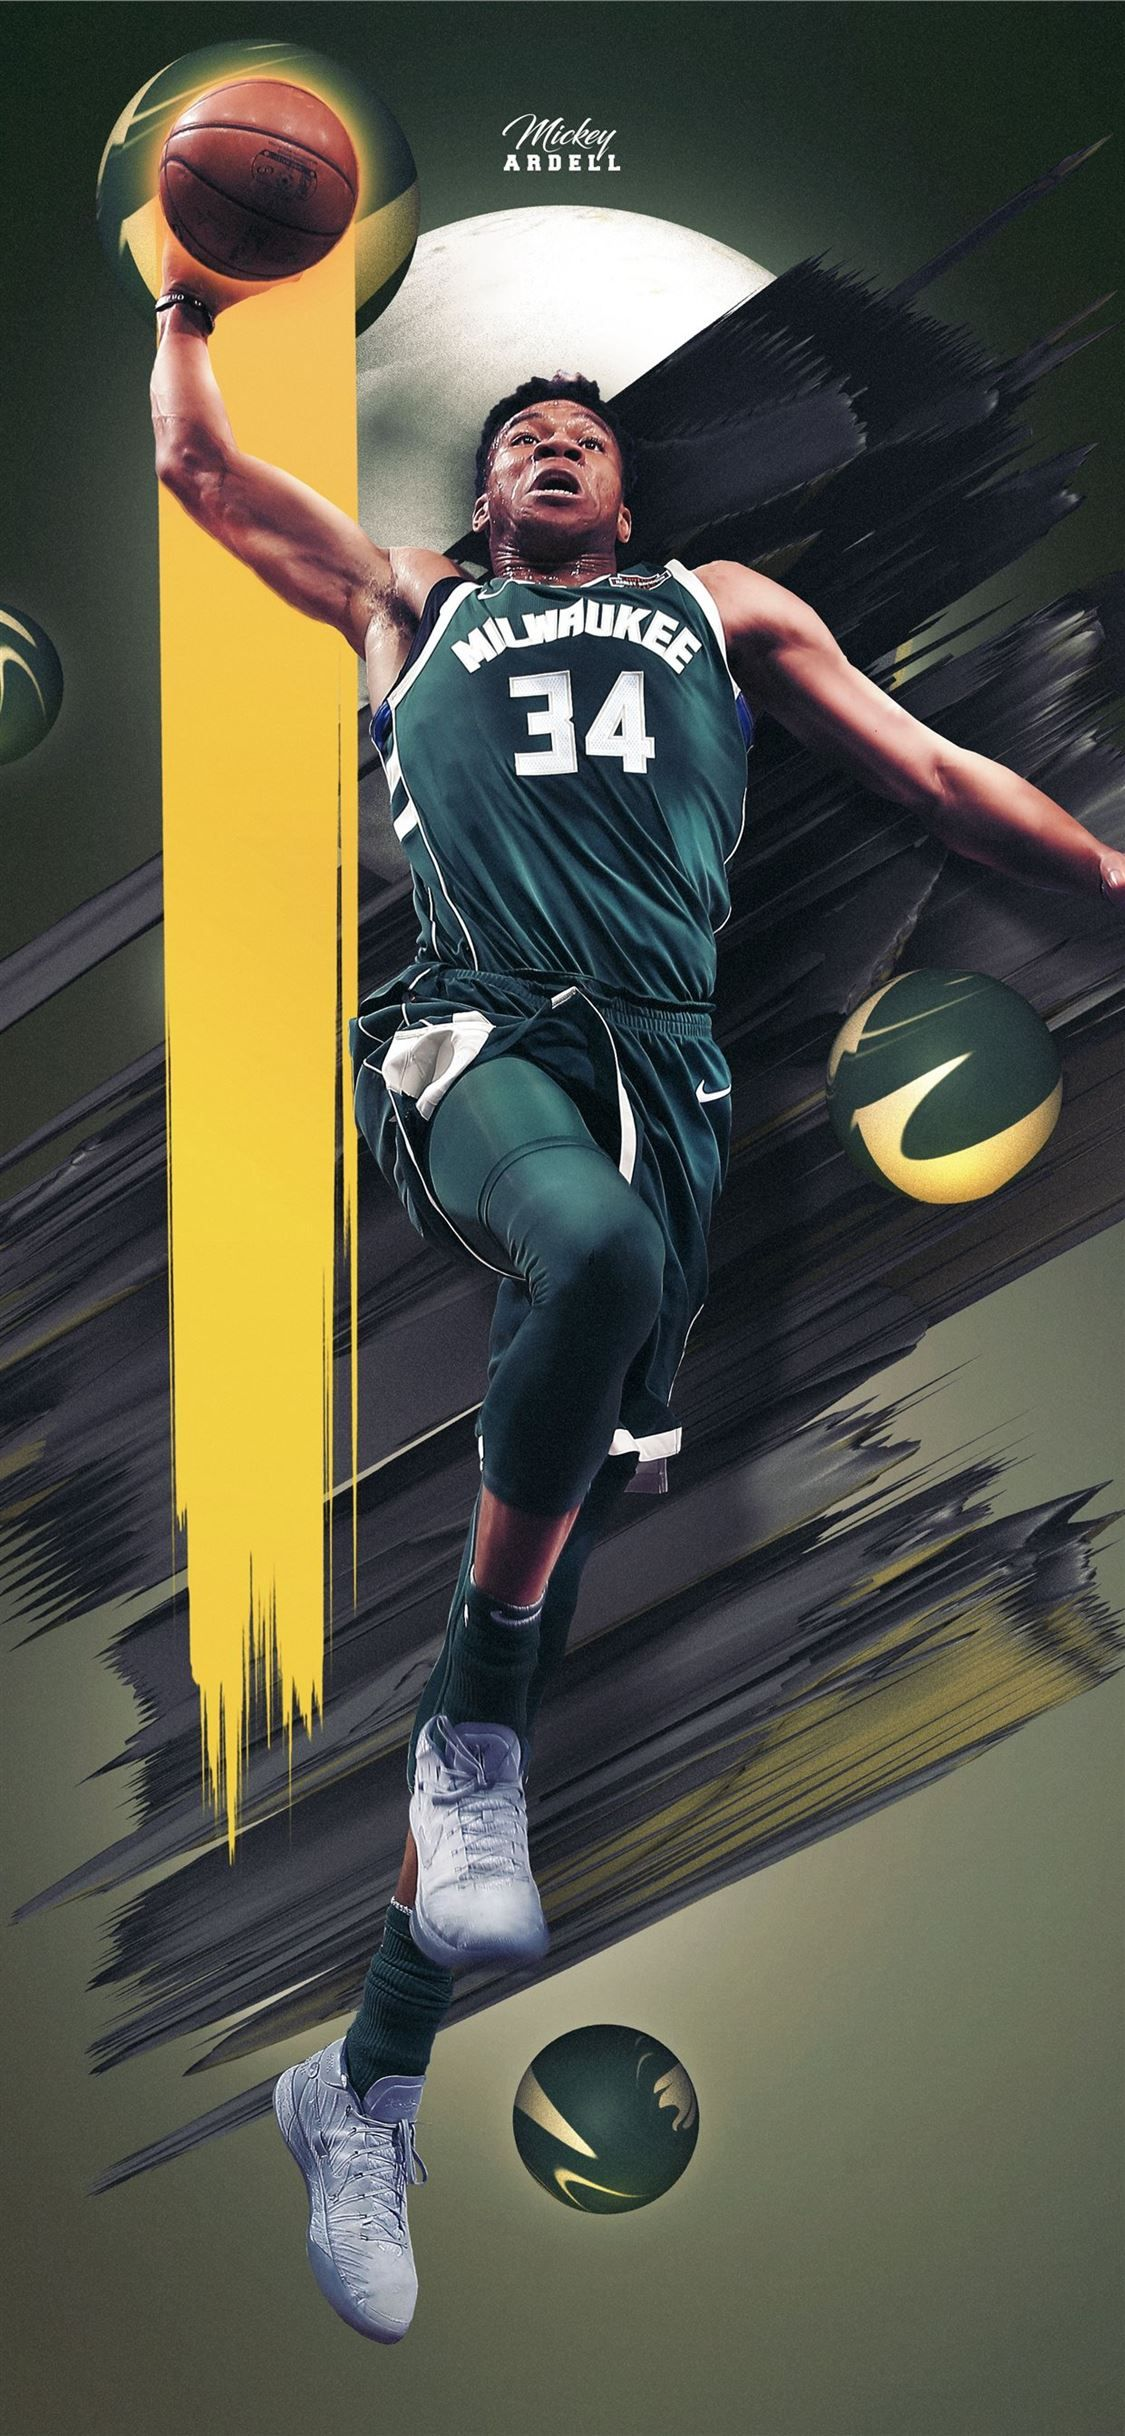 Giannis Milwaukee Bucks Nba Art Wmcskills Giannisantetokounmpo Sportcelebrity Basketballcelebrity In 2020 Nba Art Giannis Antetokounmpo Wallpaper Nba Basketball Art